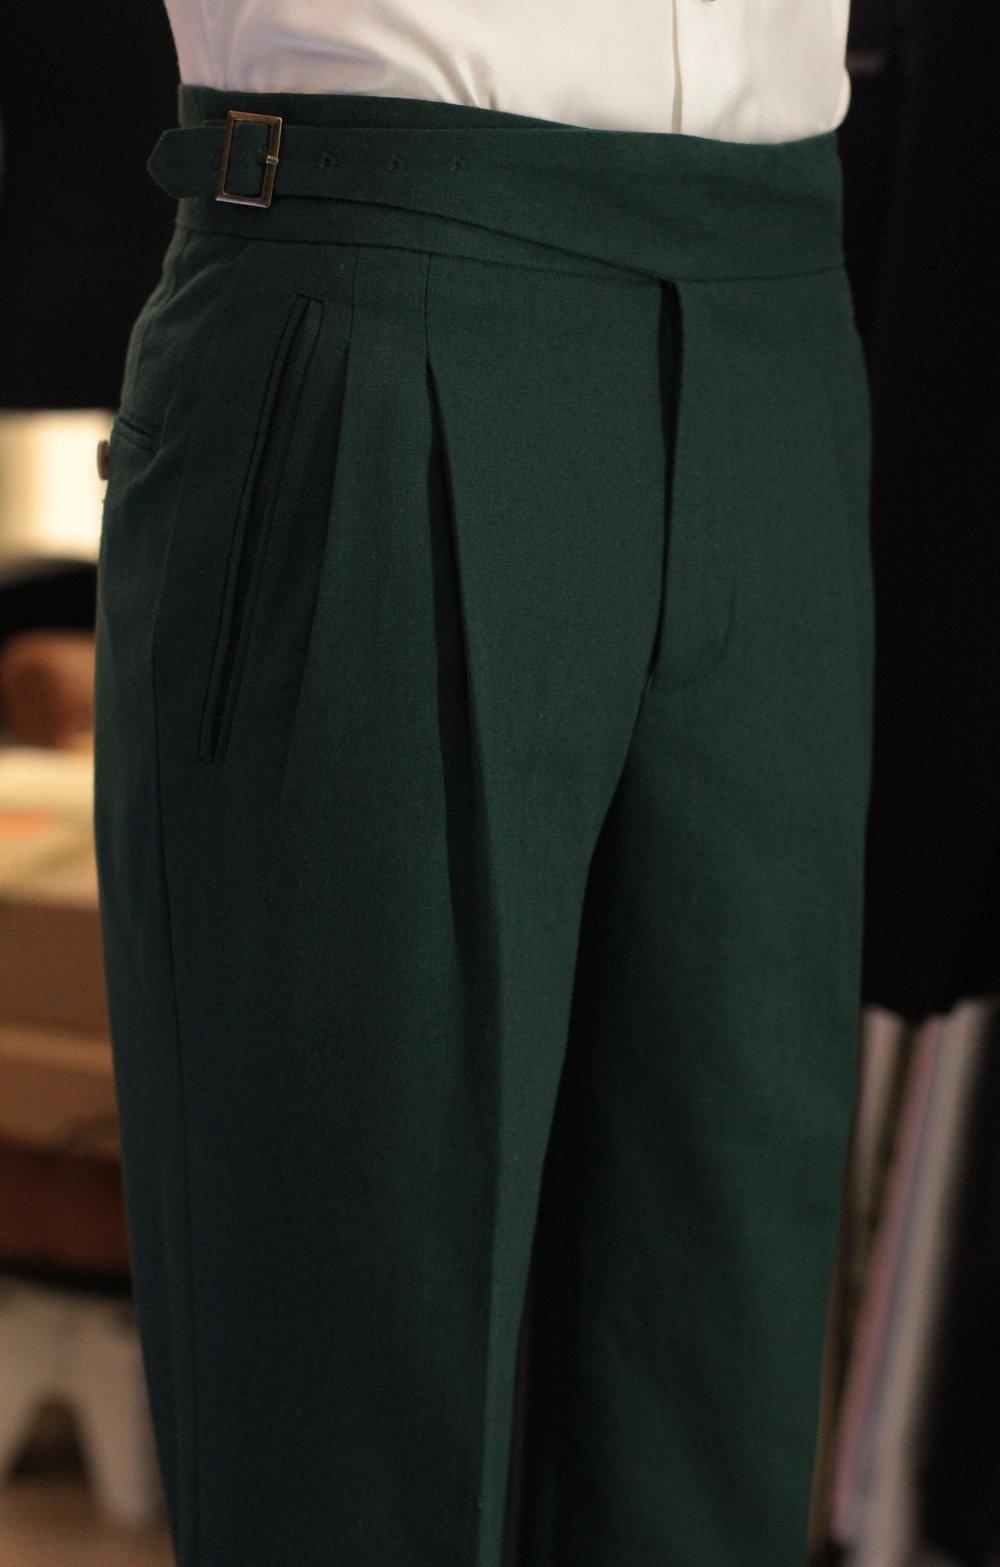 Quần tây linen với chi tiết side adjustment của Made Suits. Ảnh: made-suits.com